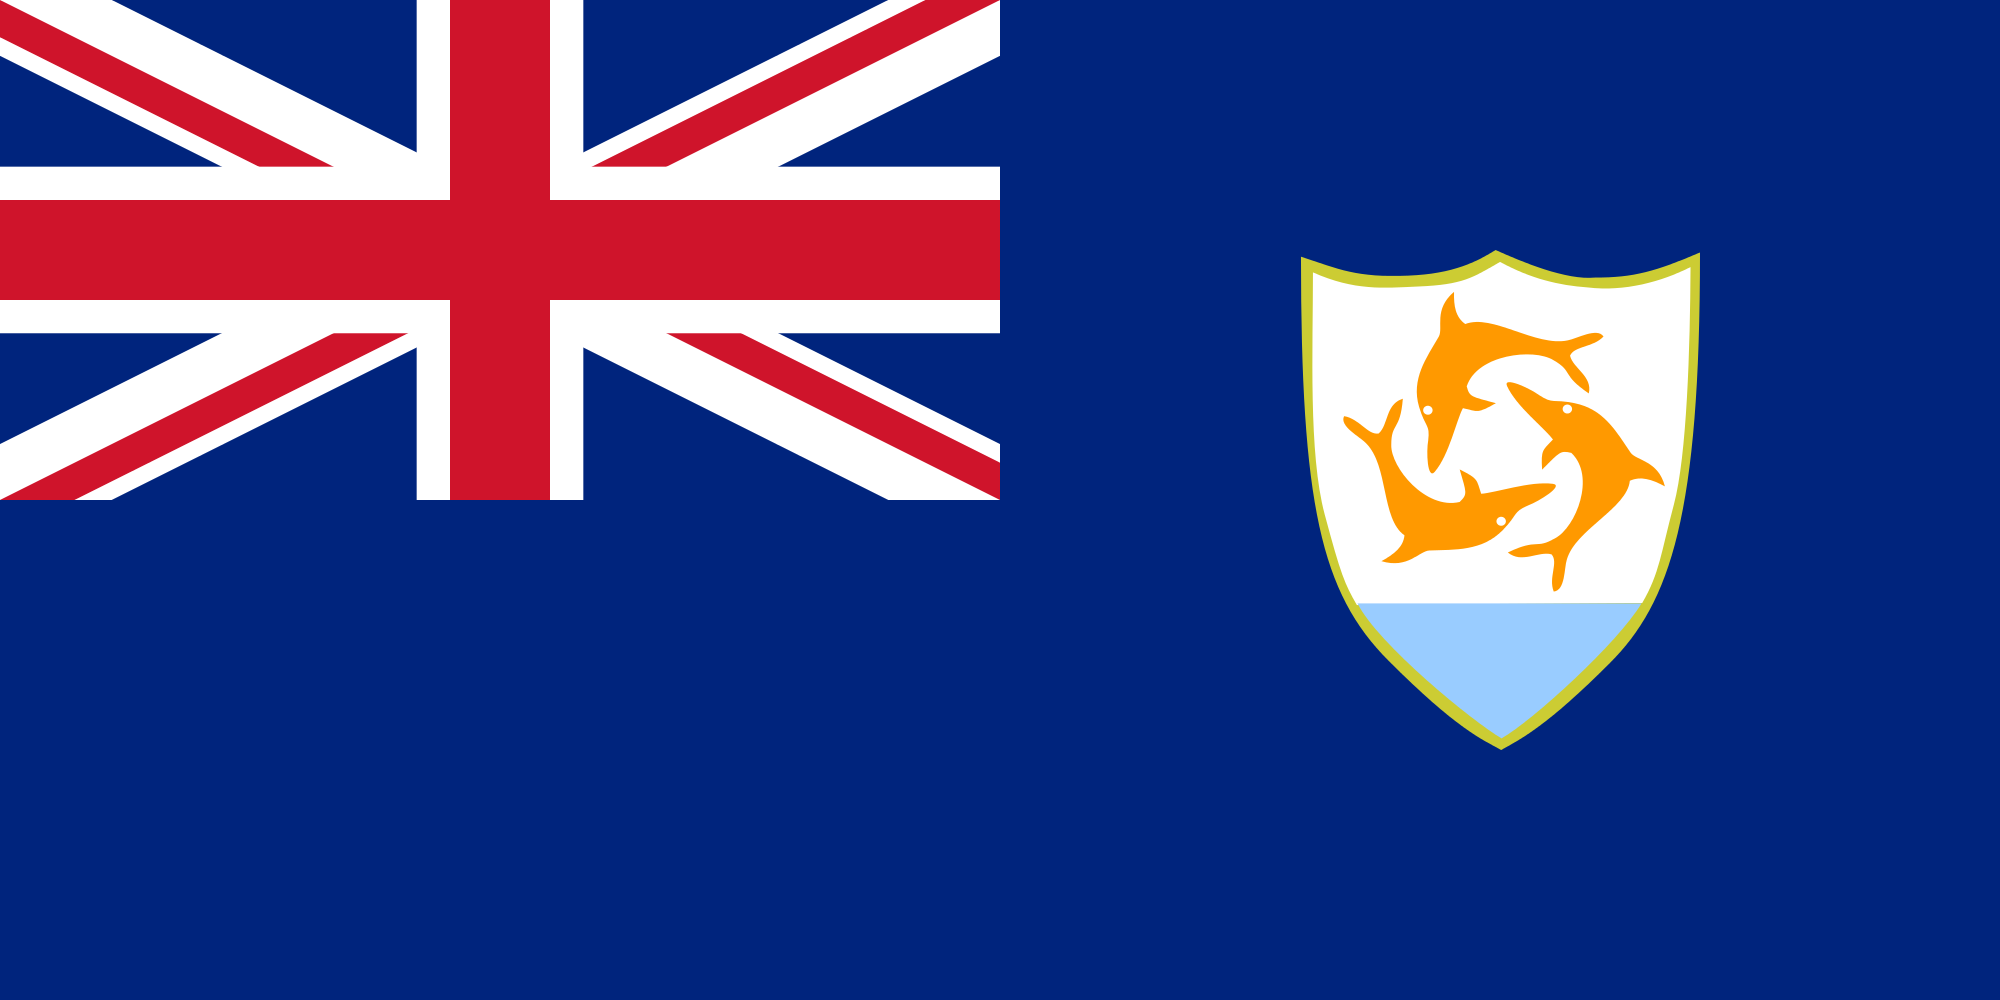 Anguilla, paese, emblema, logo, simbolo - Sfondi HD - Professor-falken.com